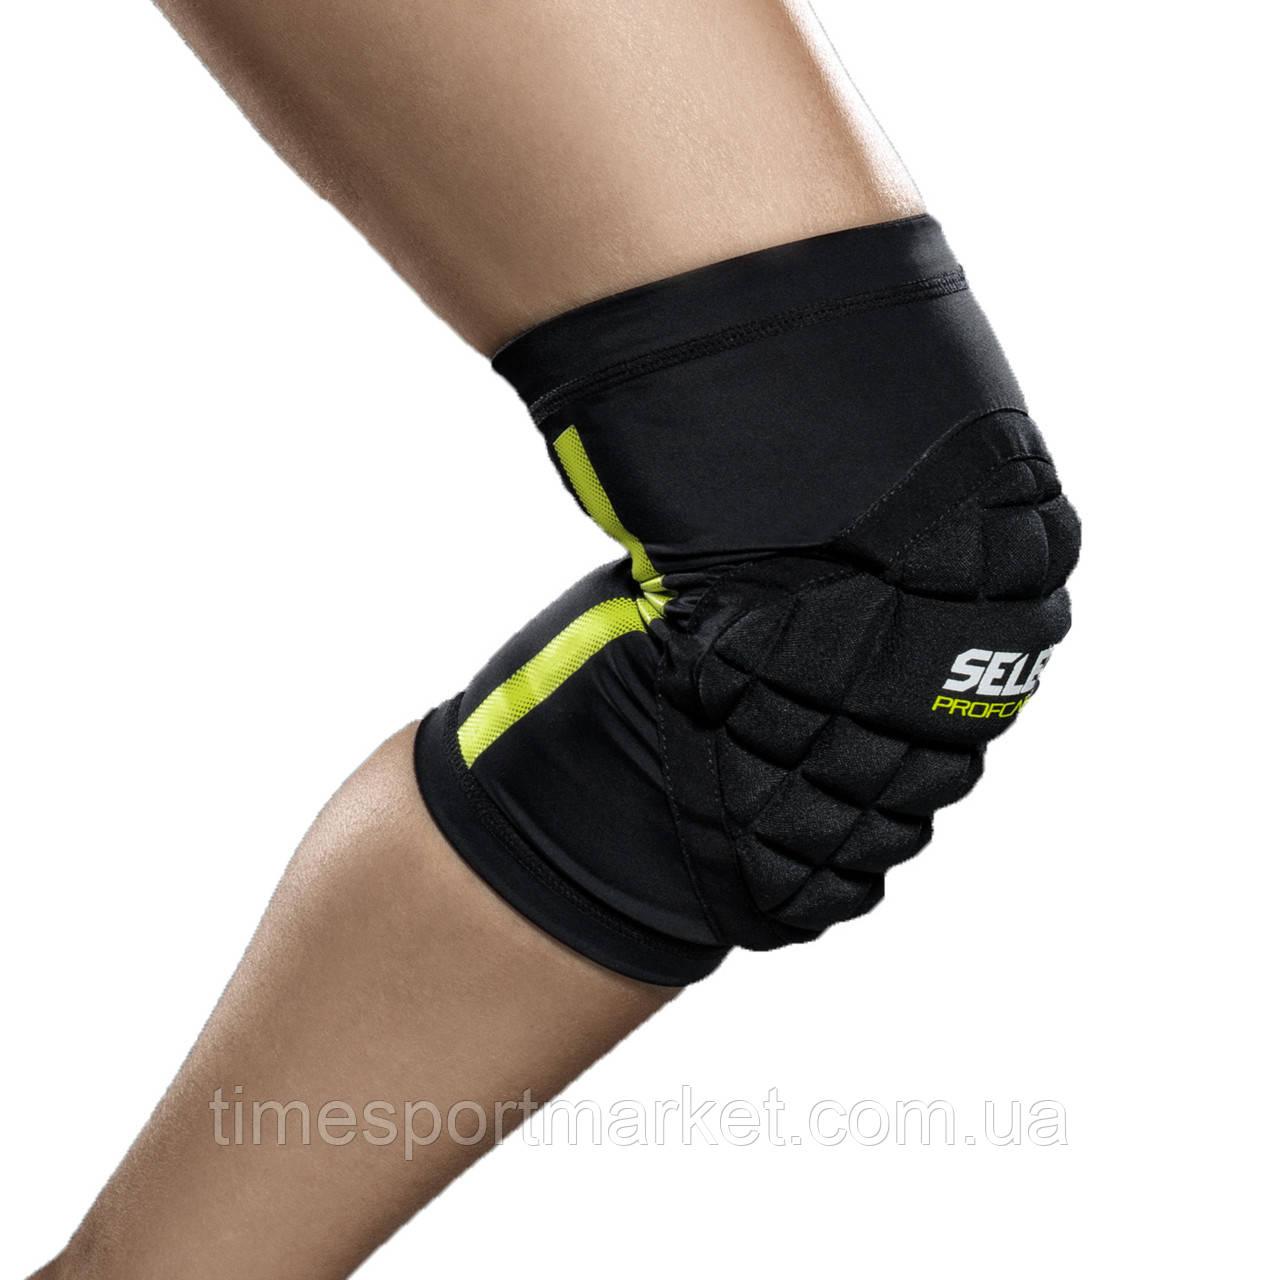 Наколенник детский SELECT Knee support - Handball Youth 6291 (2-pack) p.XL